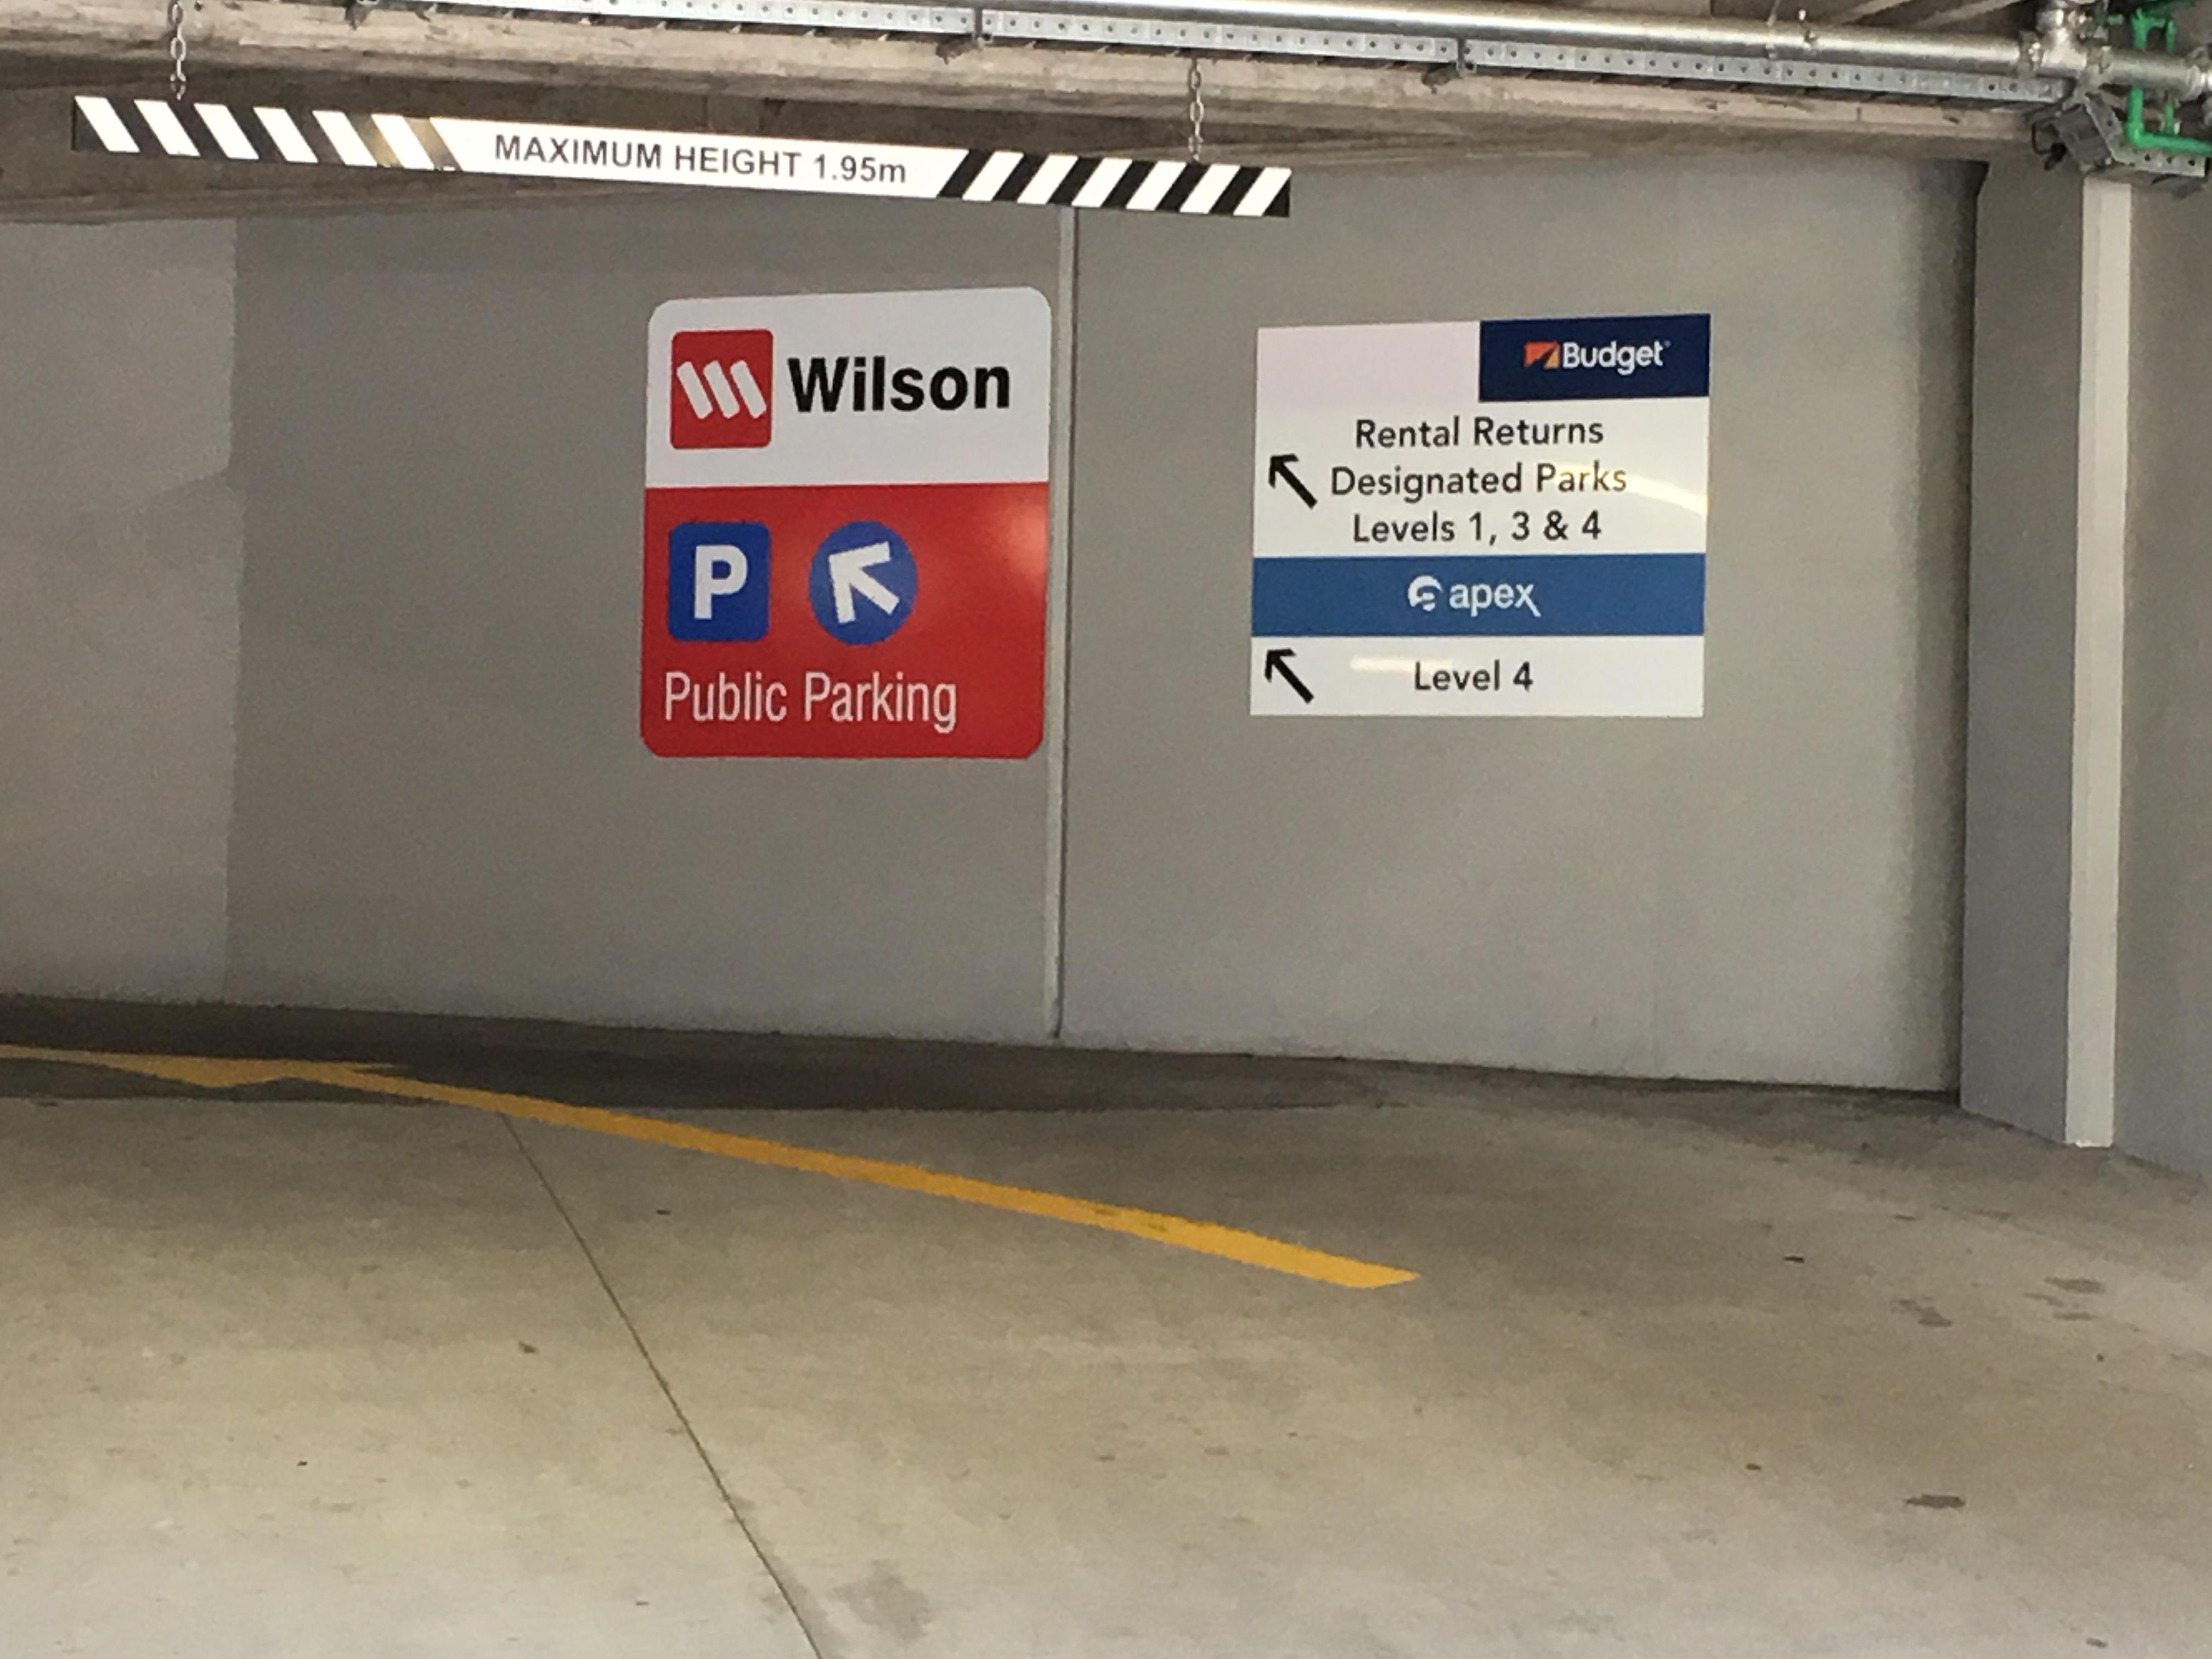 Budget Car & Truck Rental Auckland Downtown